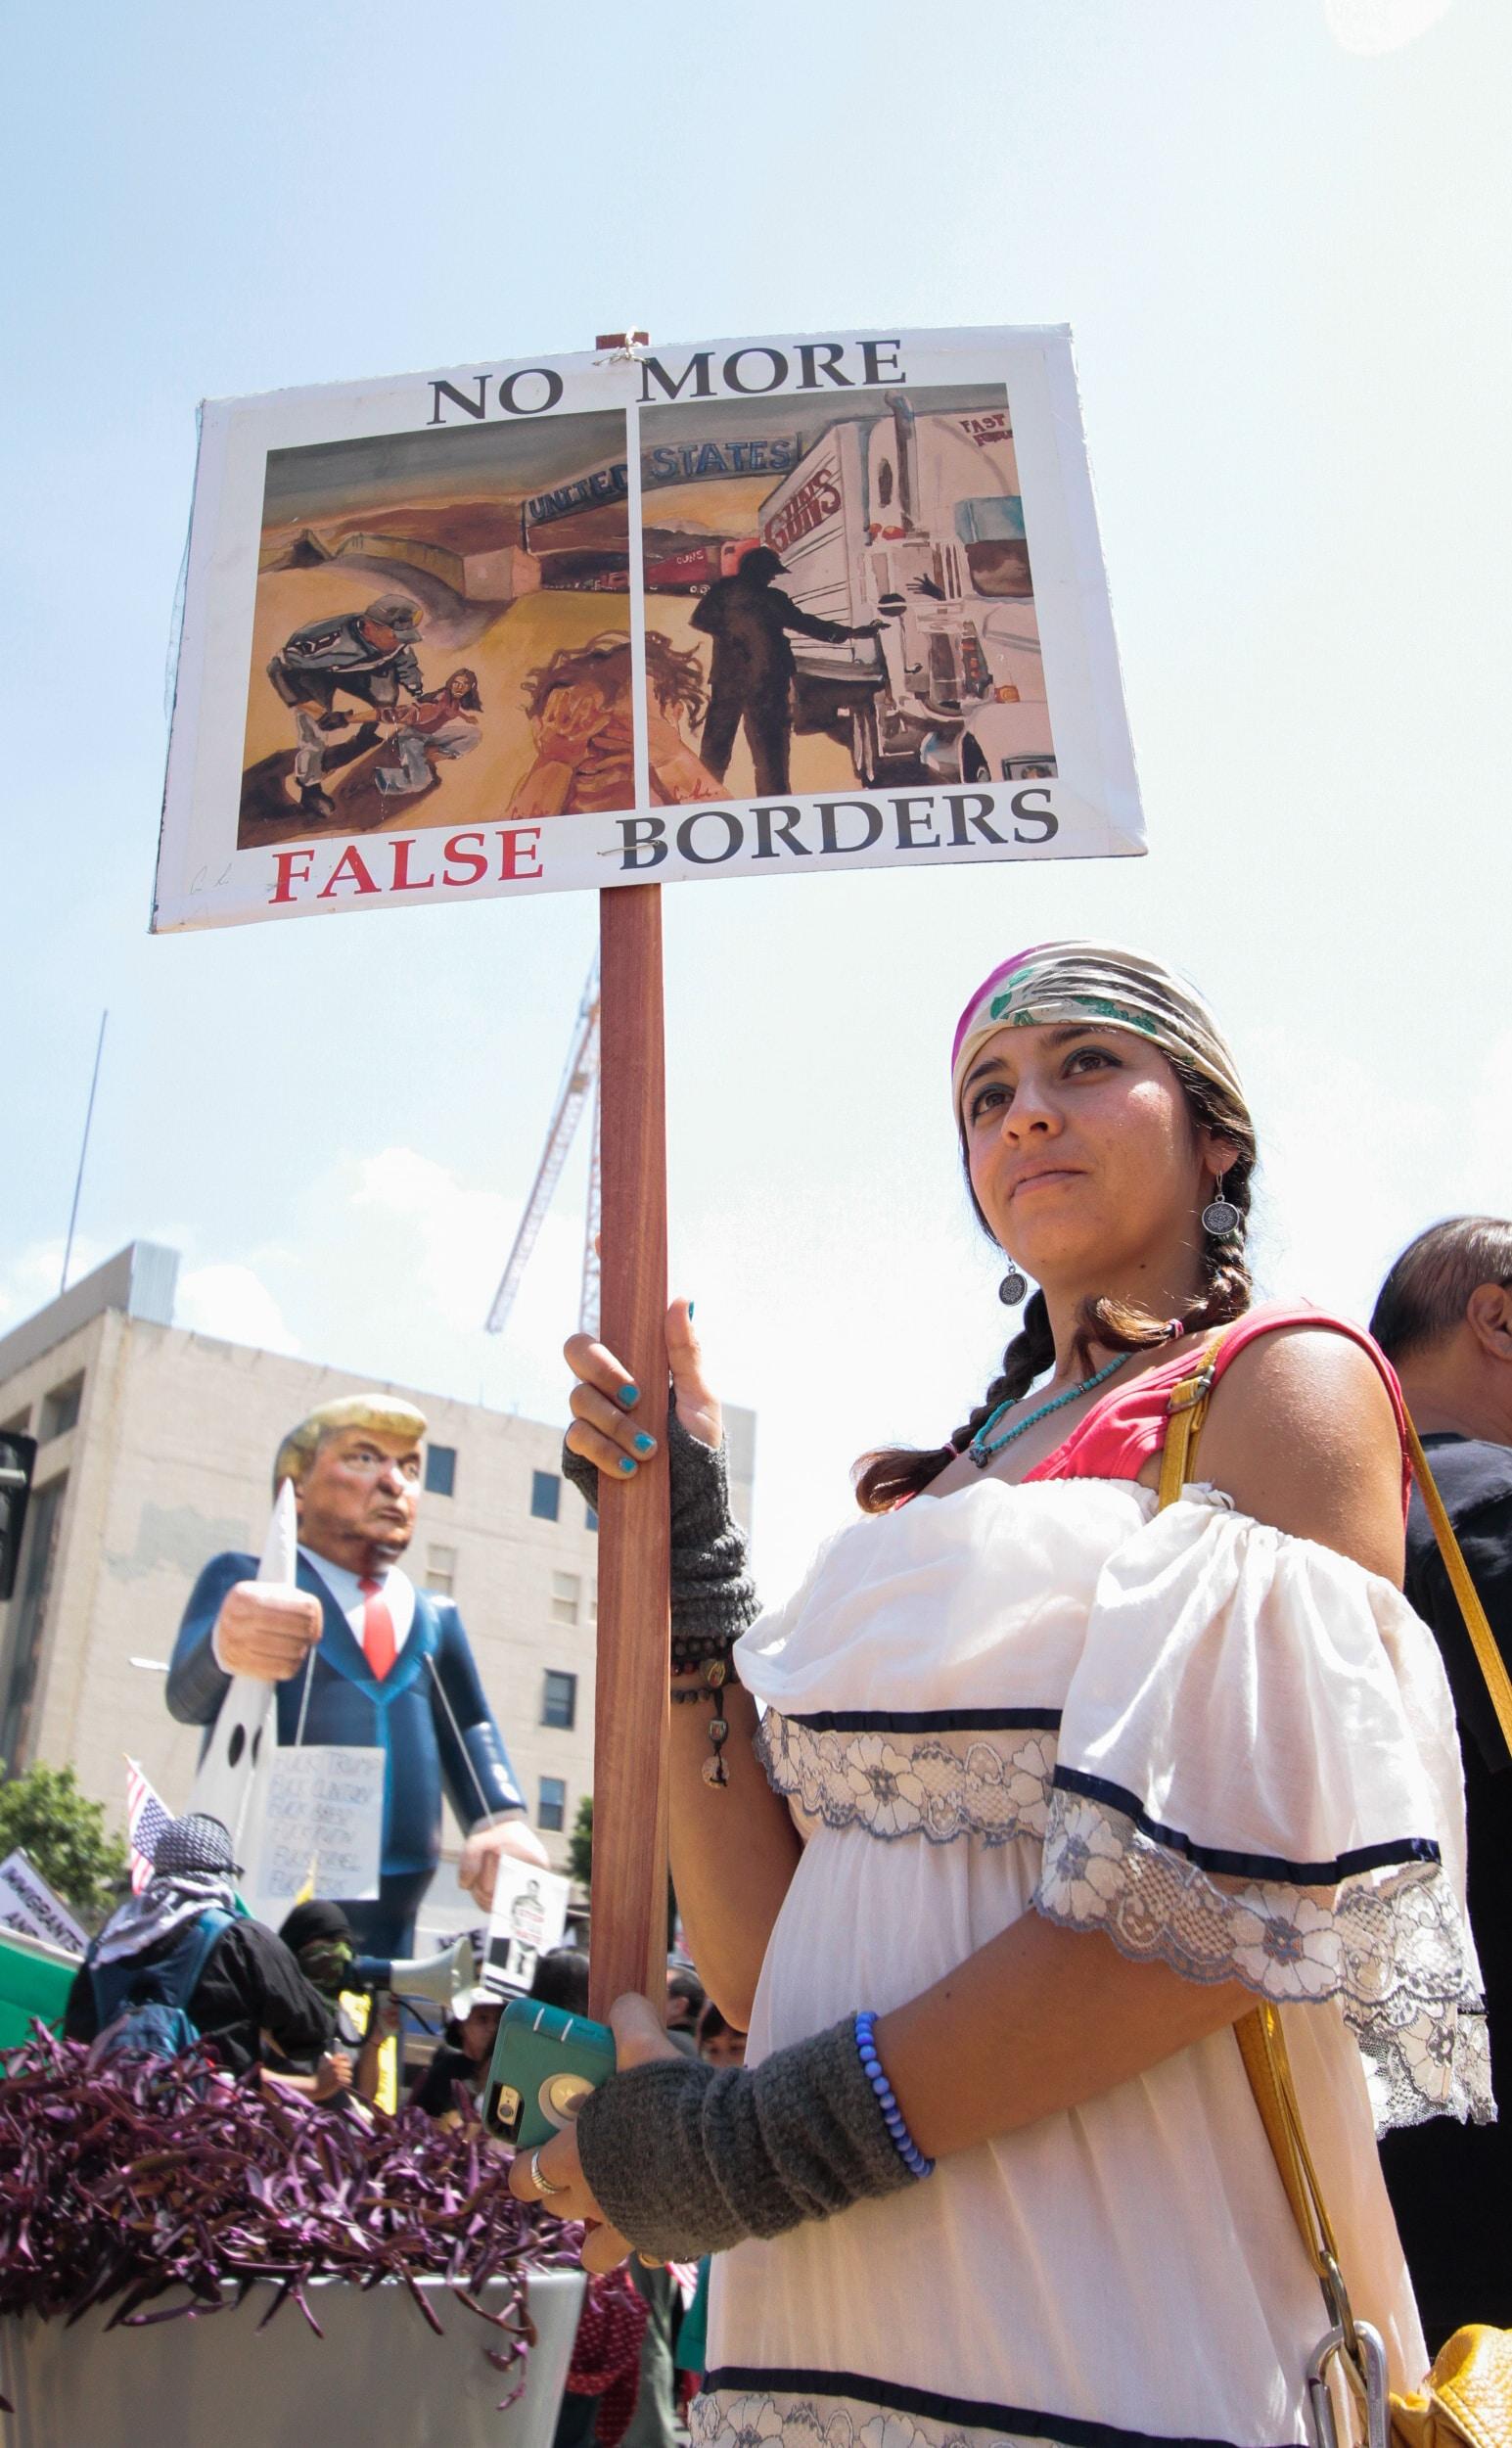 woman protesting holding no more false borders-printed board signage